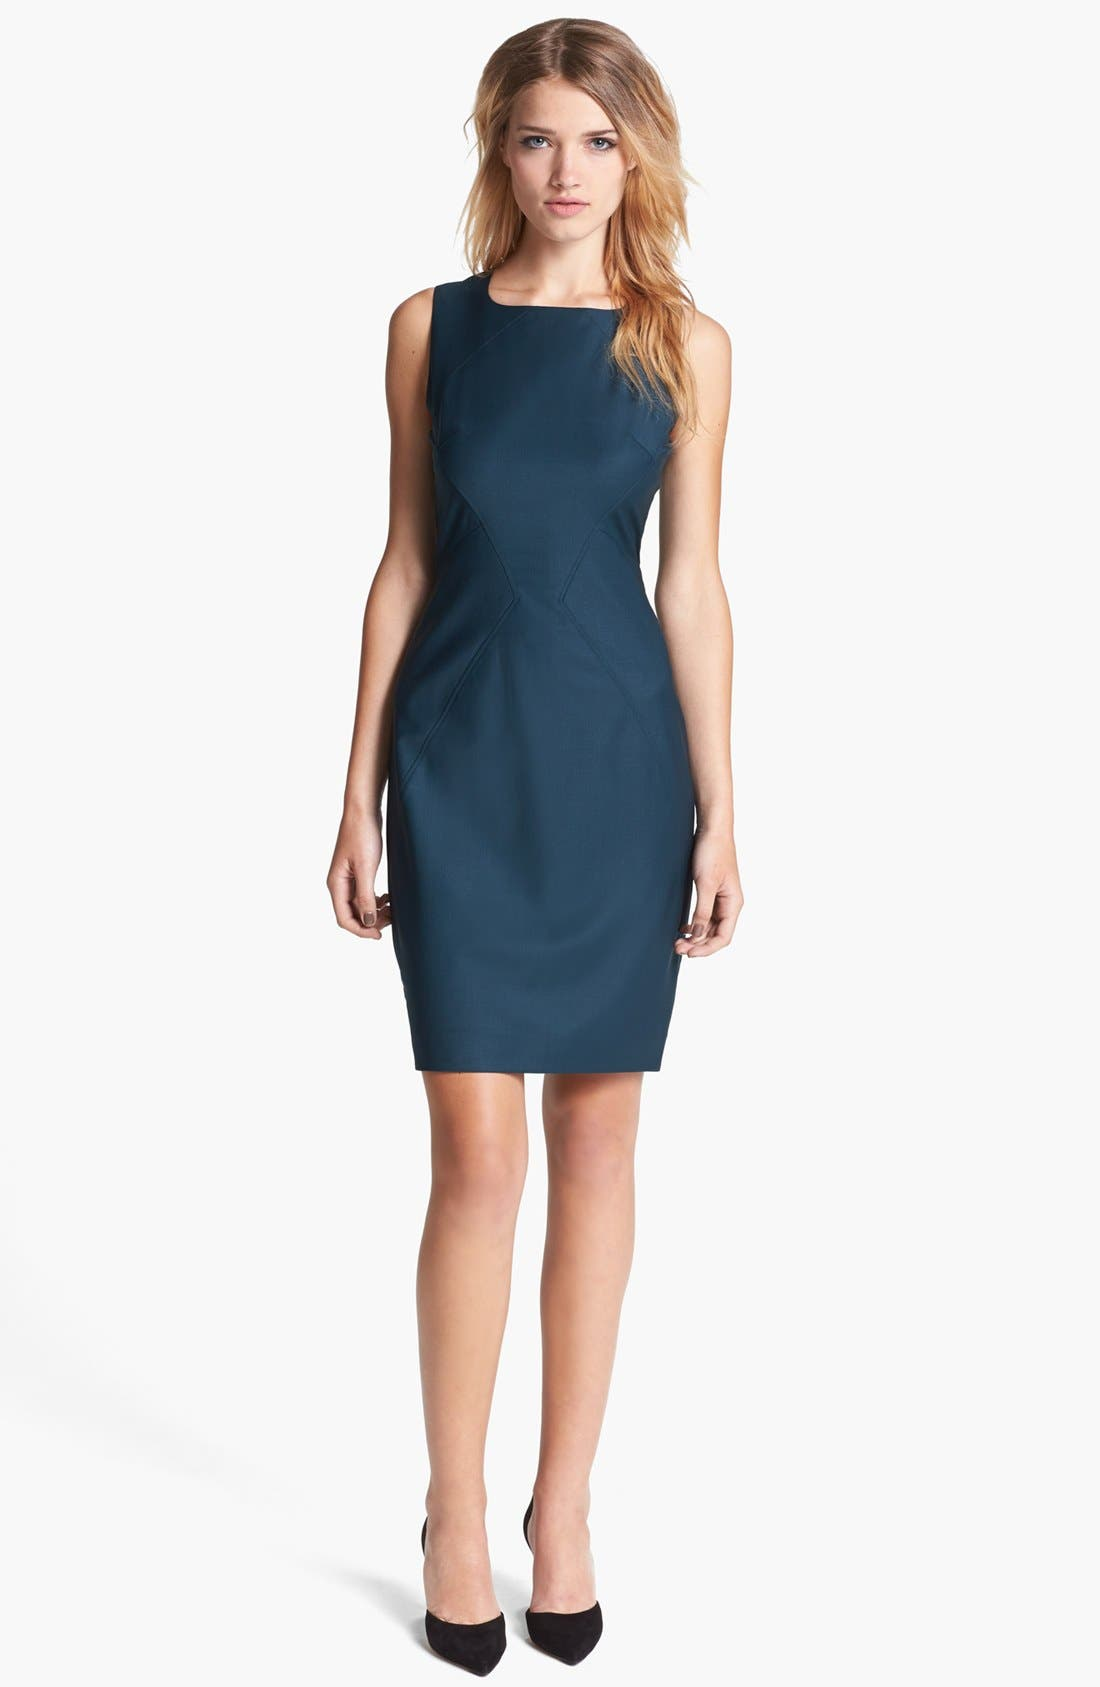 Main Image - Ted Baker London 'Shiny Lavanta' Sheath Dress